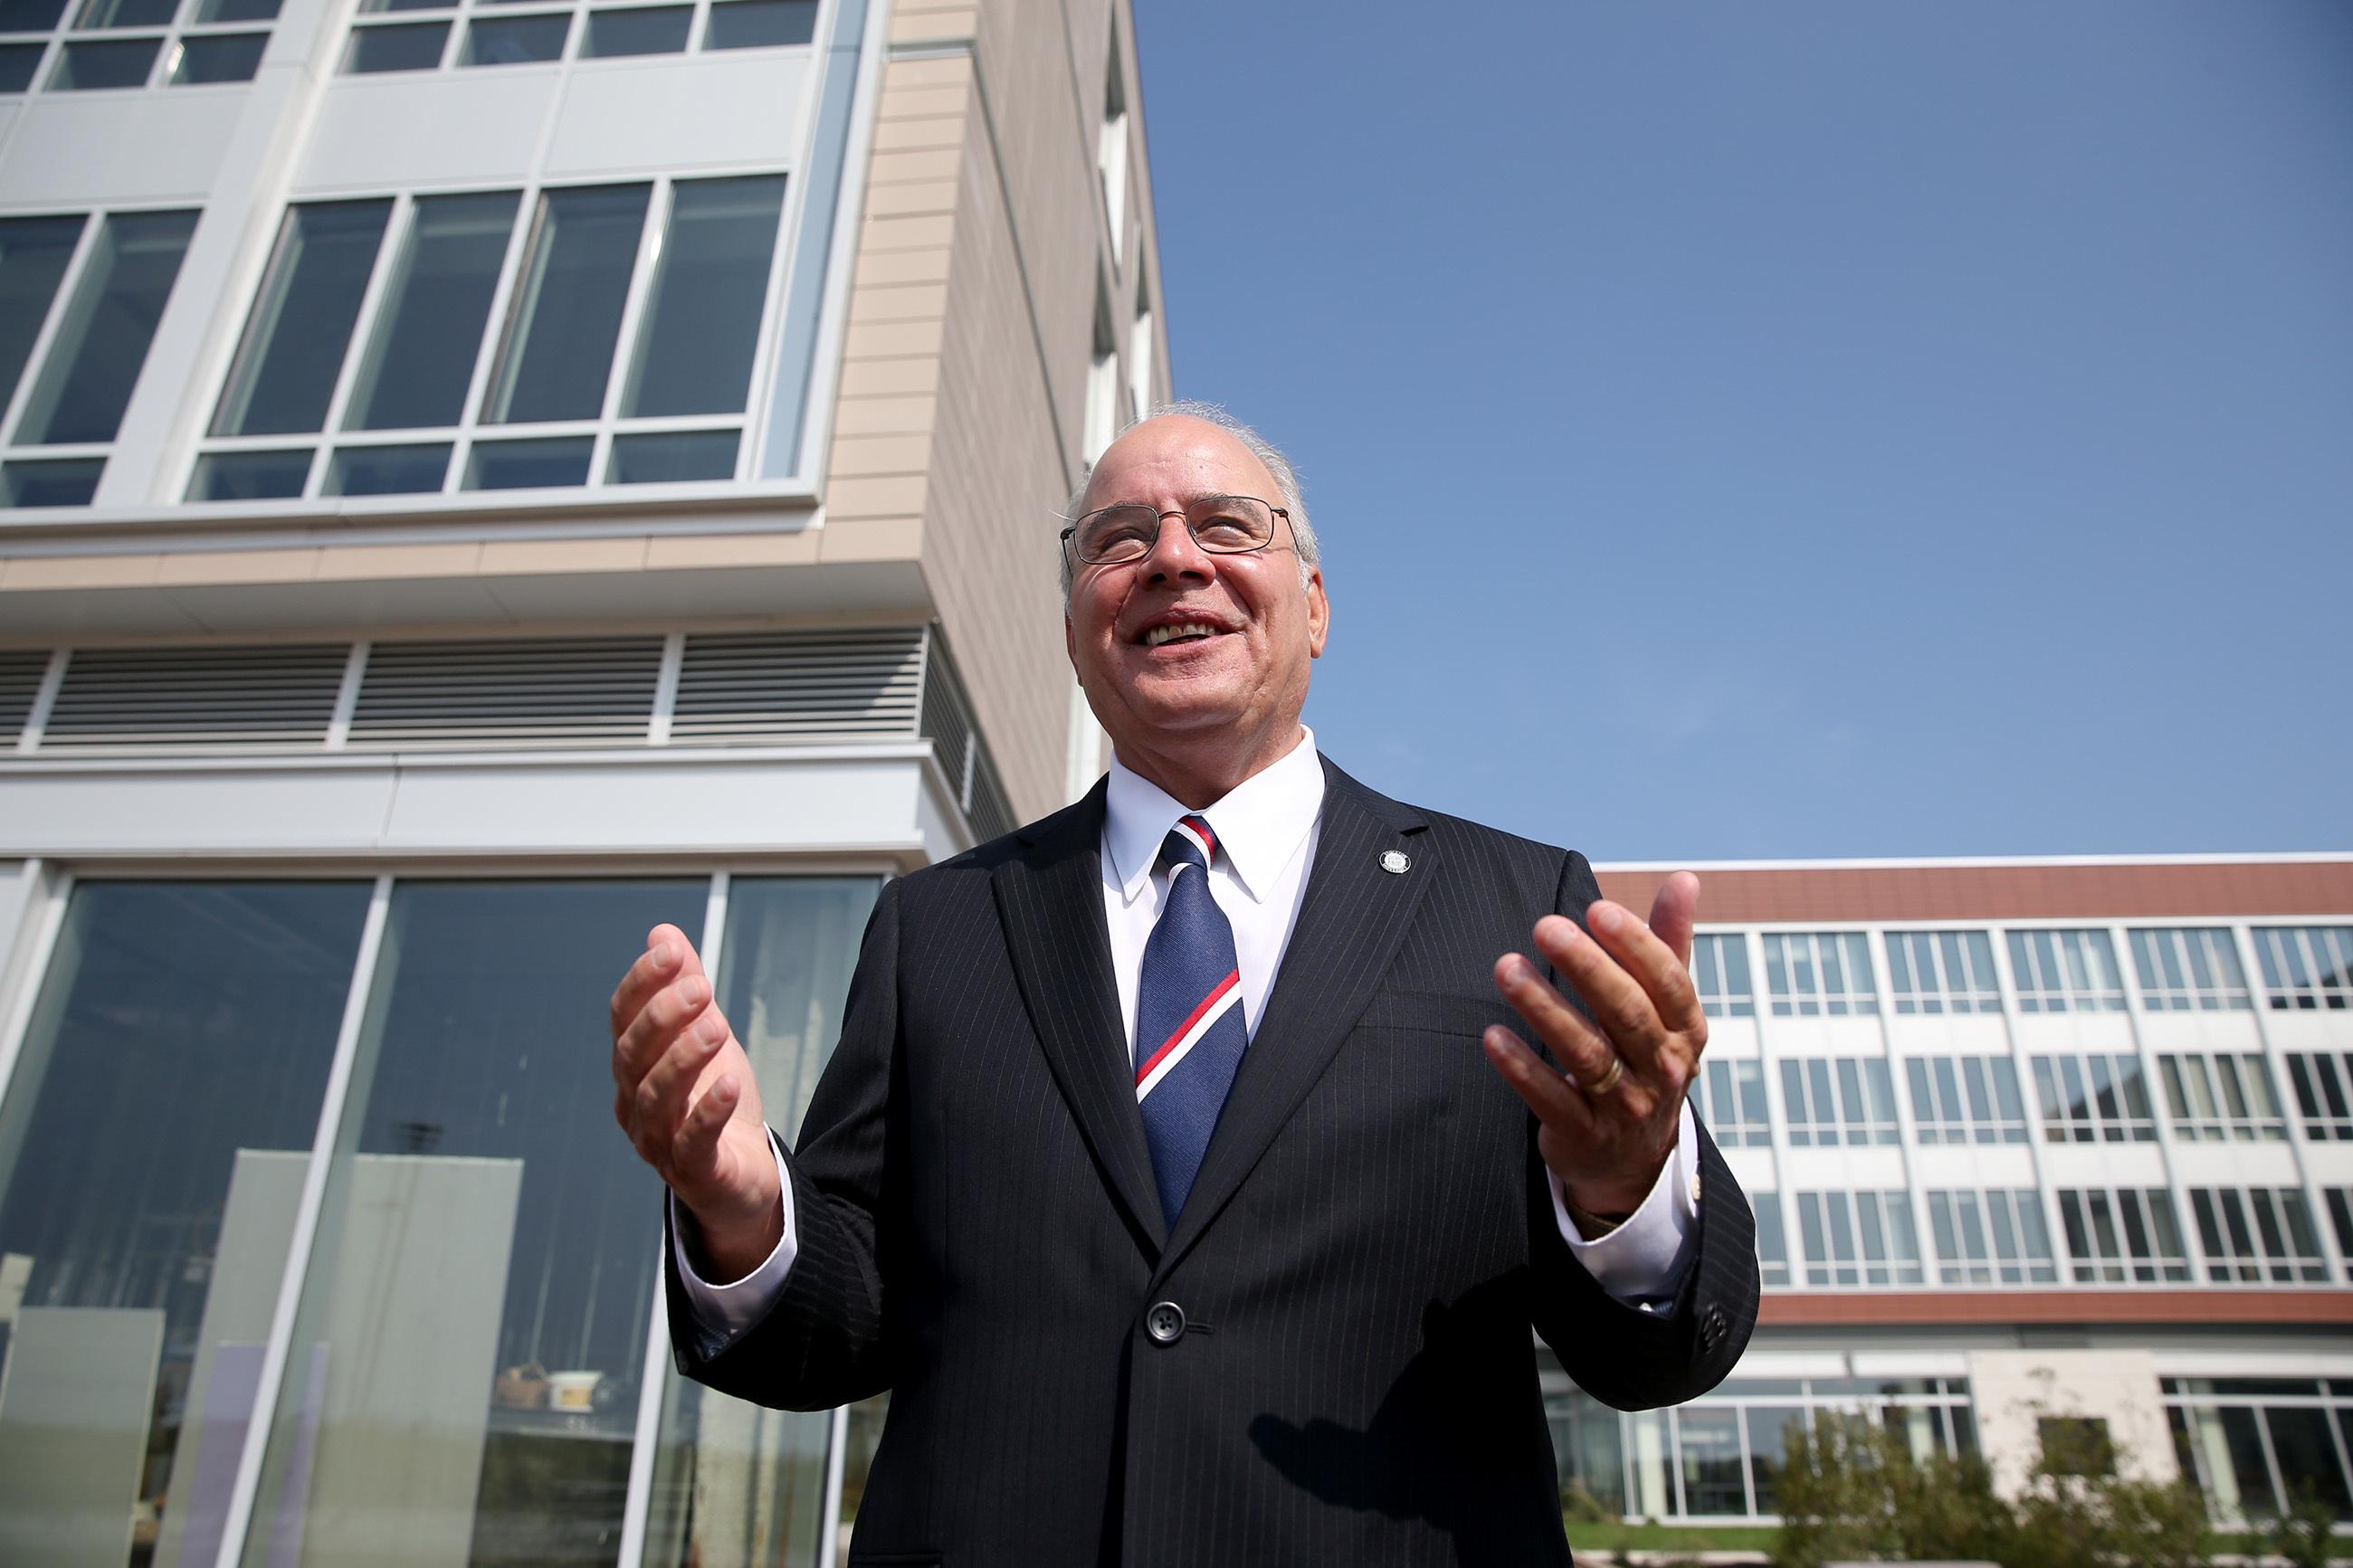 Stockton University president Harvey Kesselman speaks outside Stockton University´s Atlantic City campus in Atlantic City, NJ on August 27, 2018.